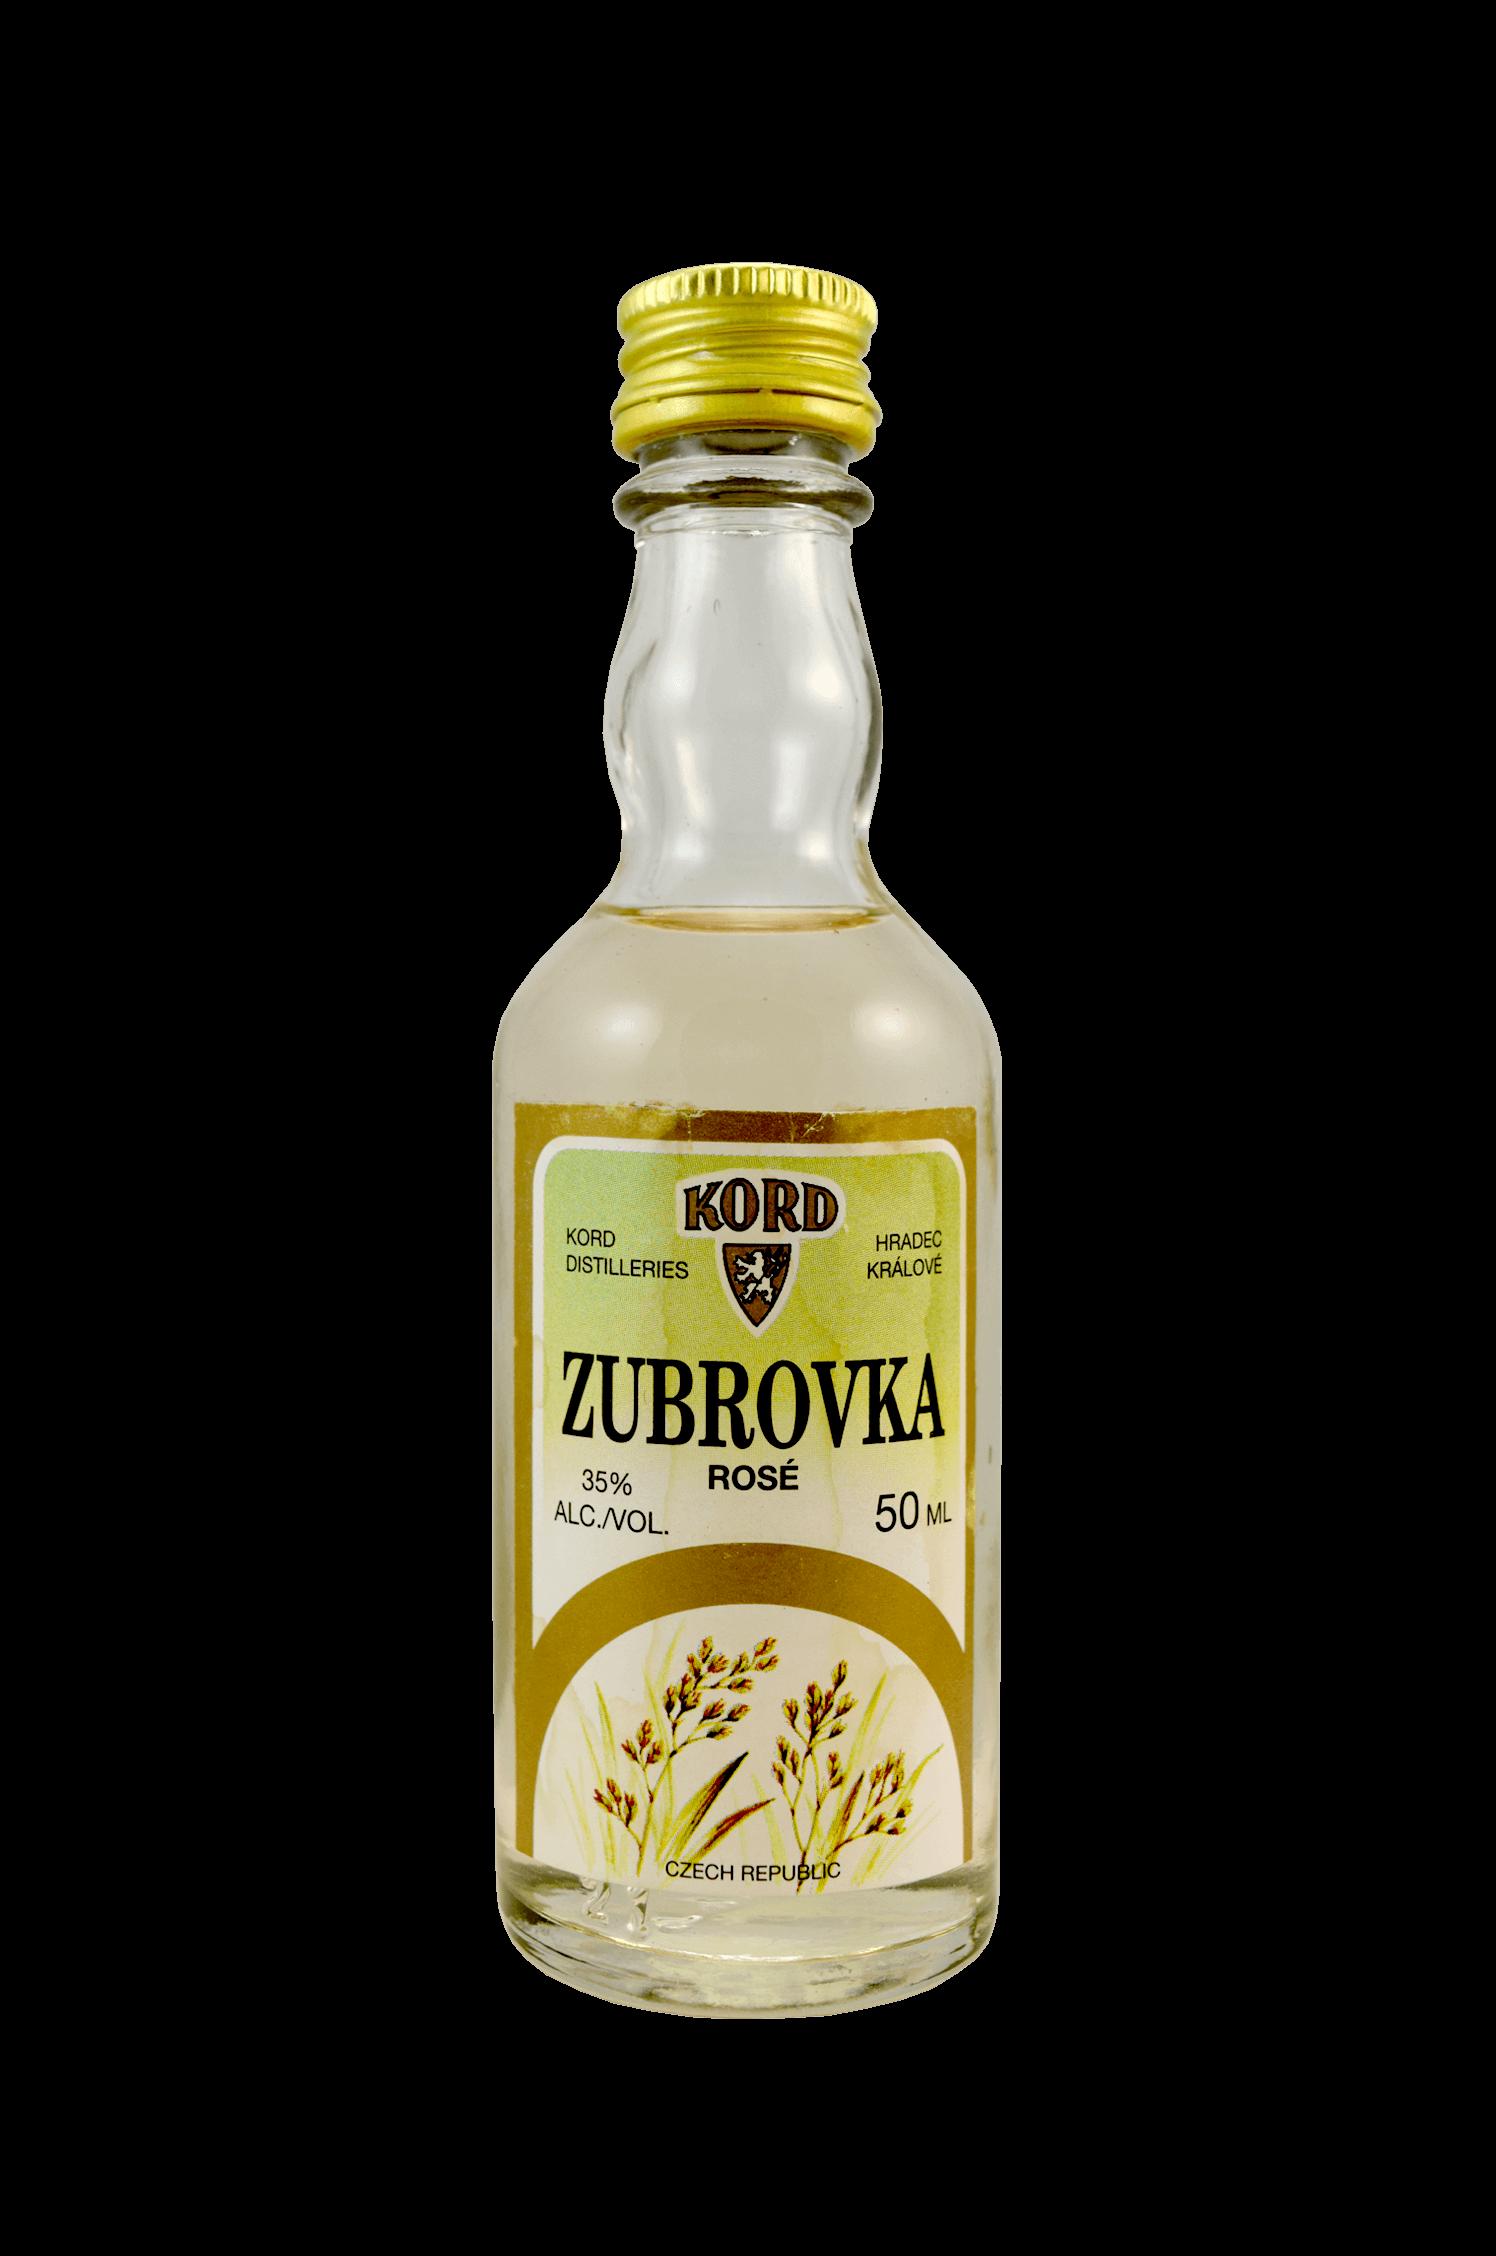 Kord Zubrovka Rosé